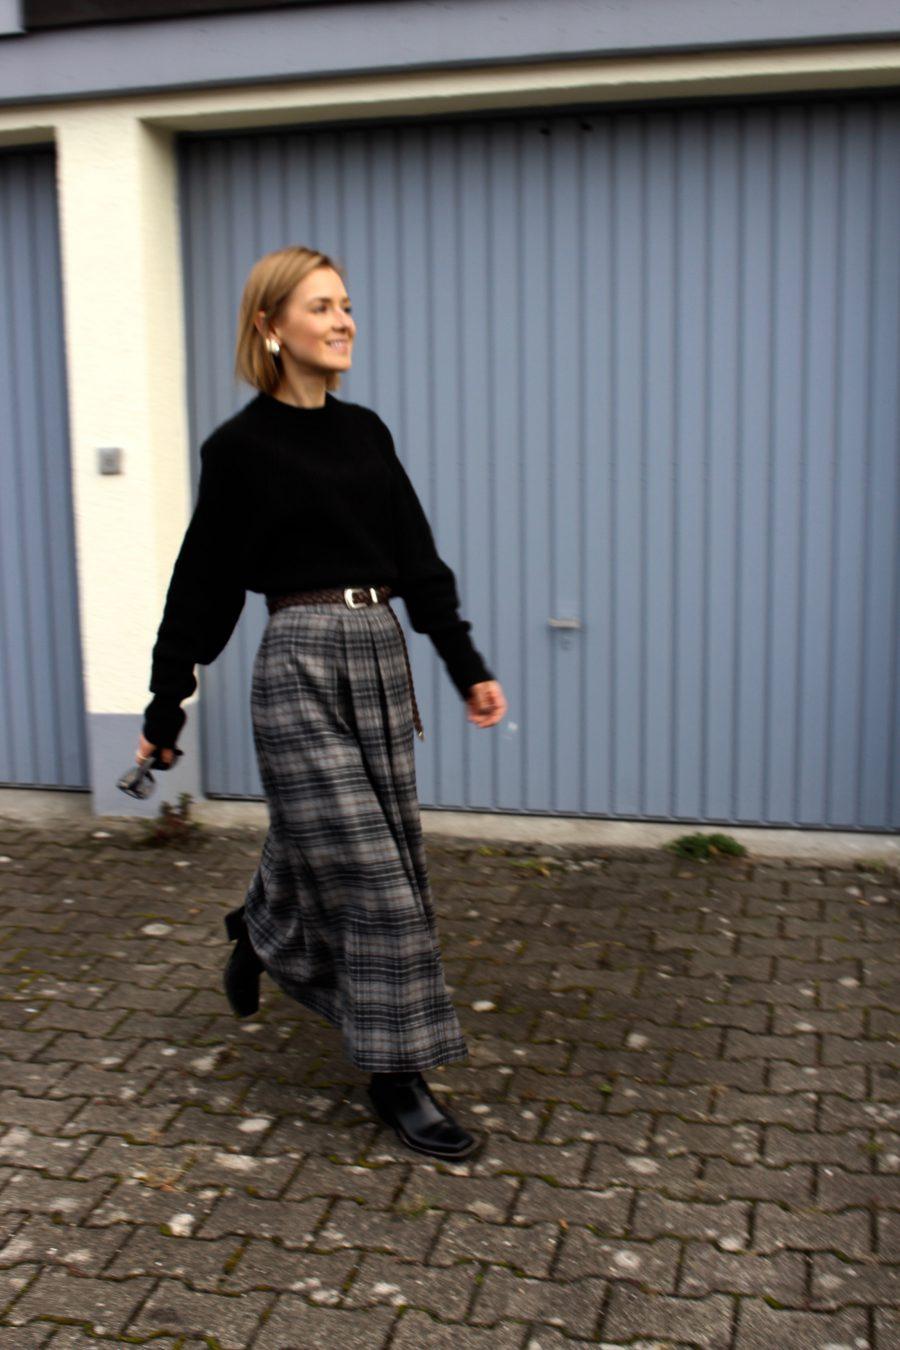 The Massimo Dutti Winter Capsule Skirt